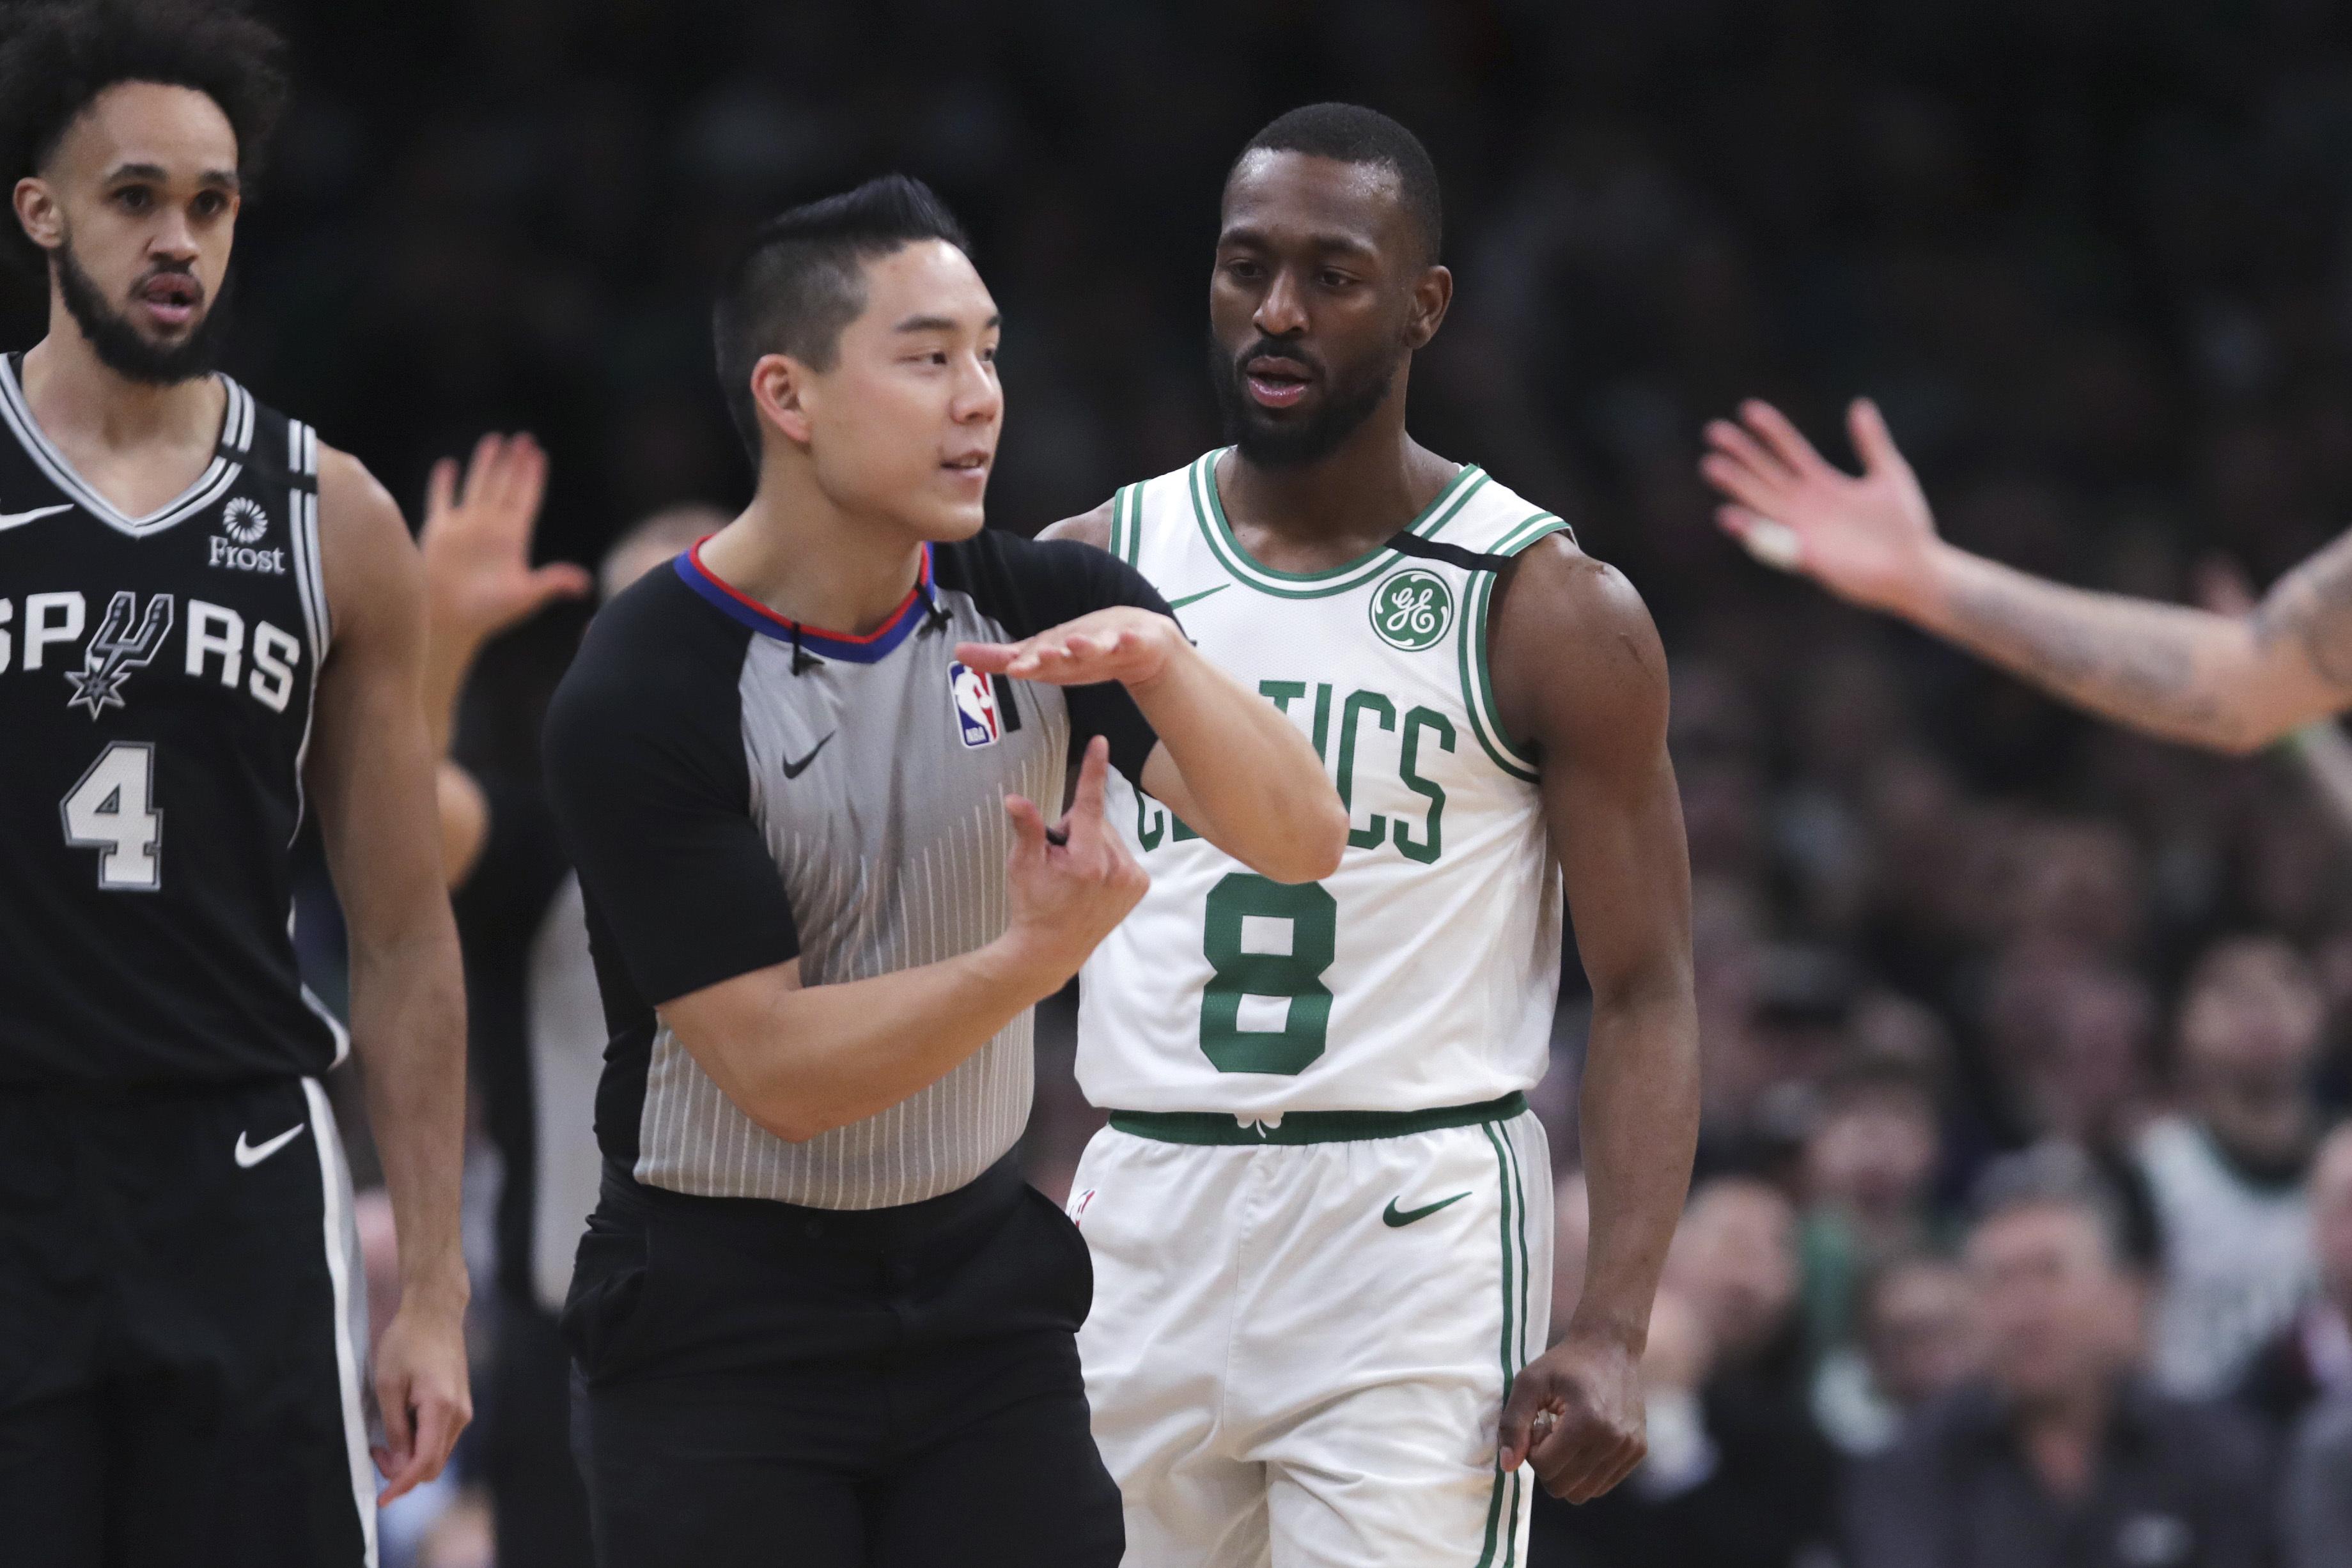 DeRozan scores 30, Walker tossed, Spurs beat Celtics 129-114